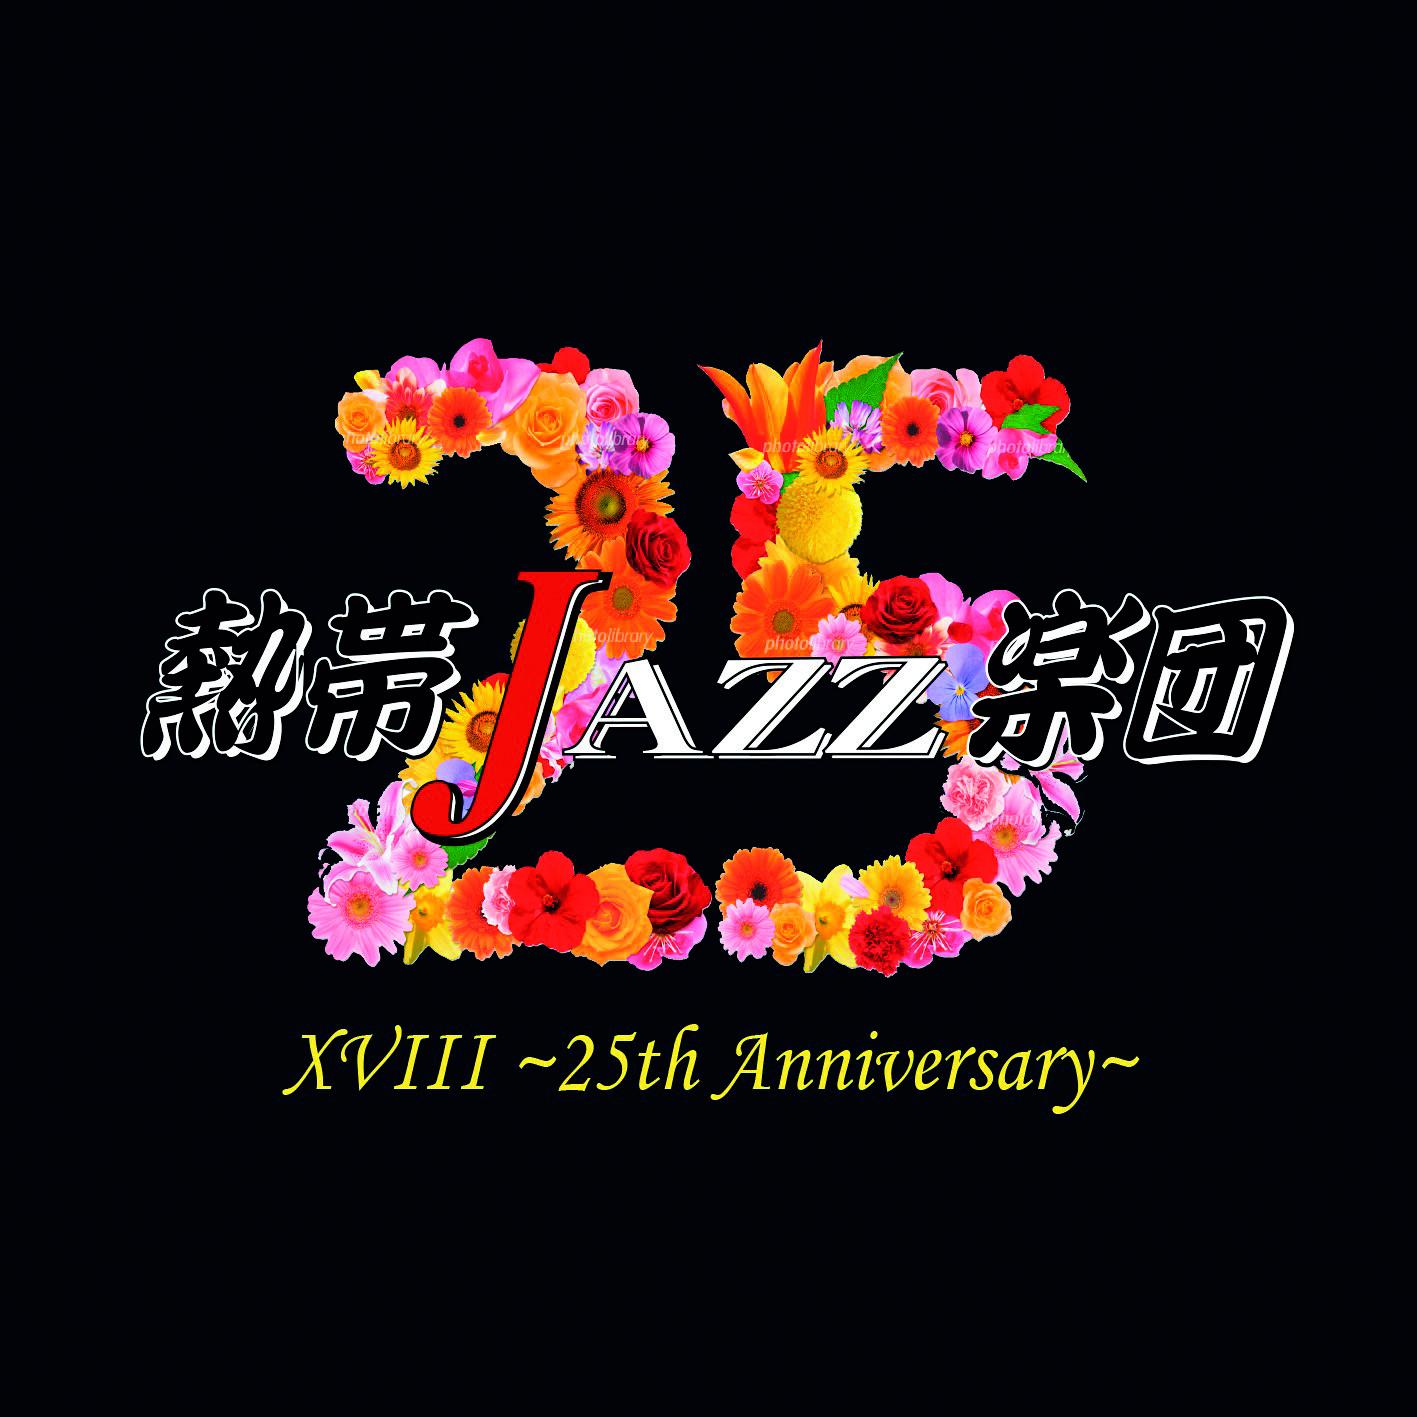 『熱帯JAZZ楽団 XVⅢ 〜25th Anniversary〜』